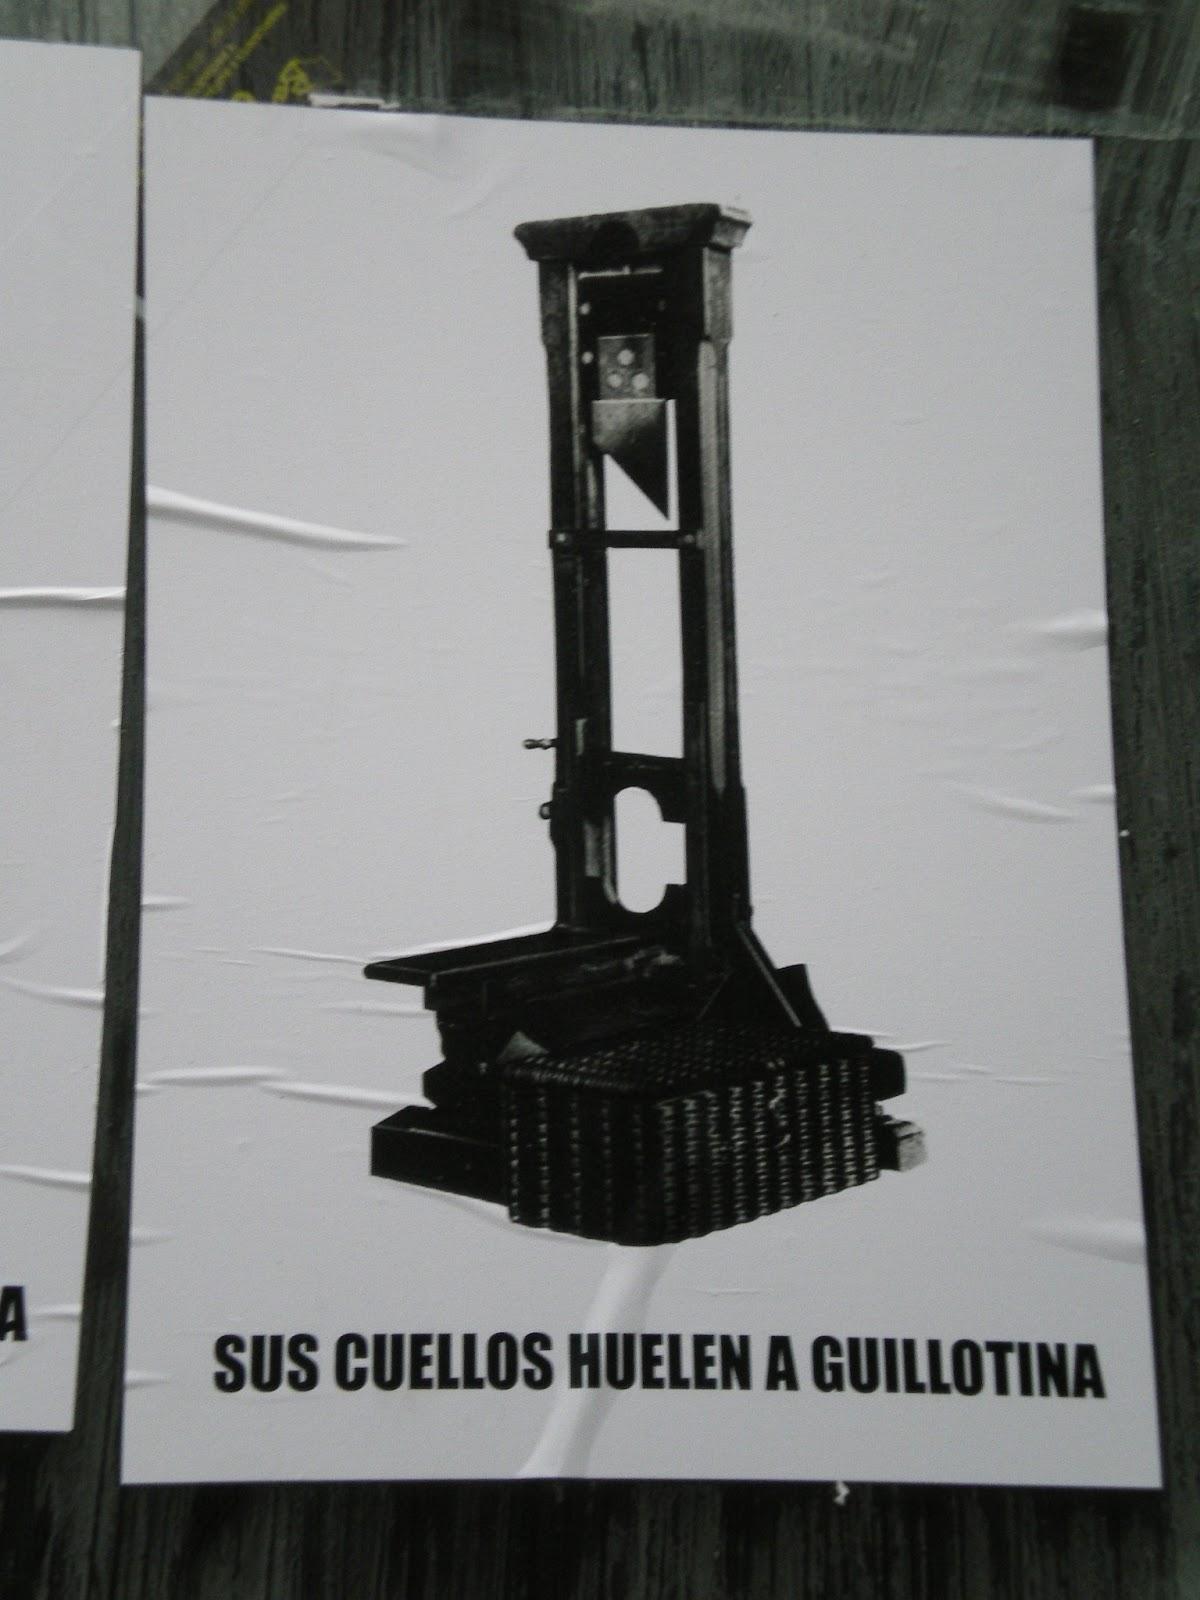 sus cuellos huelen a guillotina